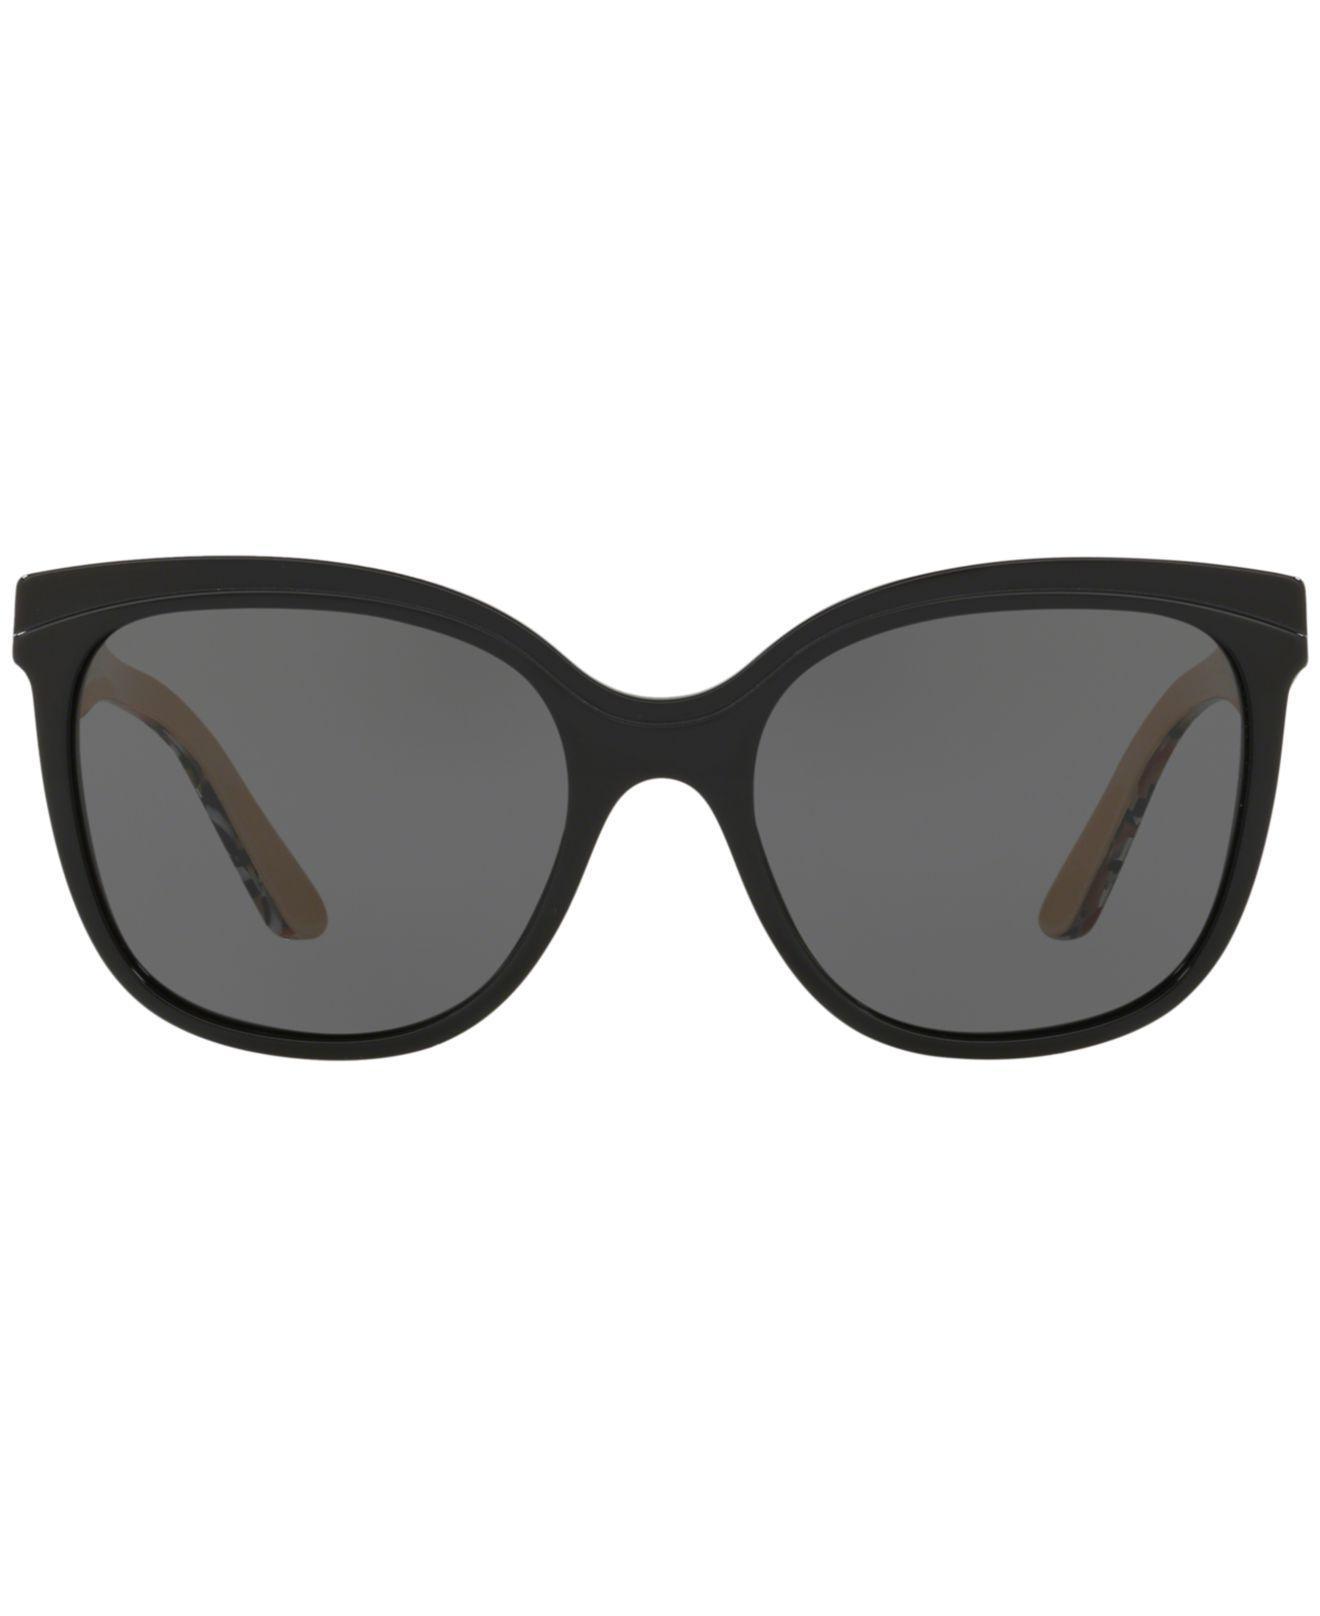 3c3446879d63 Lyst - Burberry Sunglasses